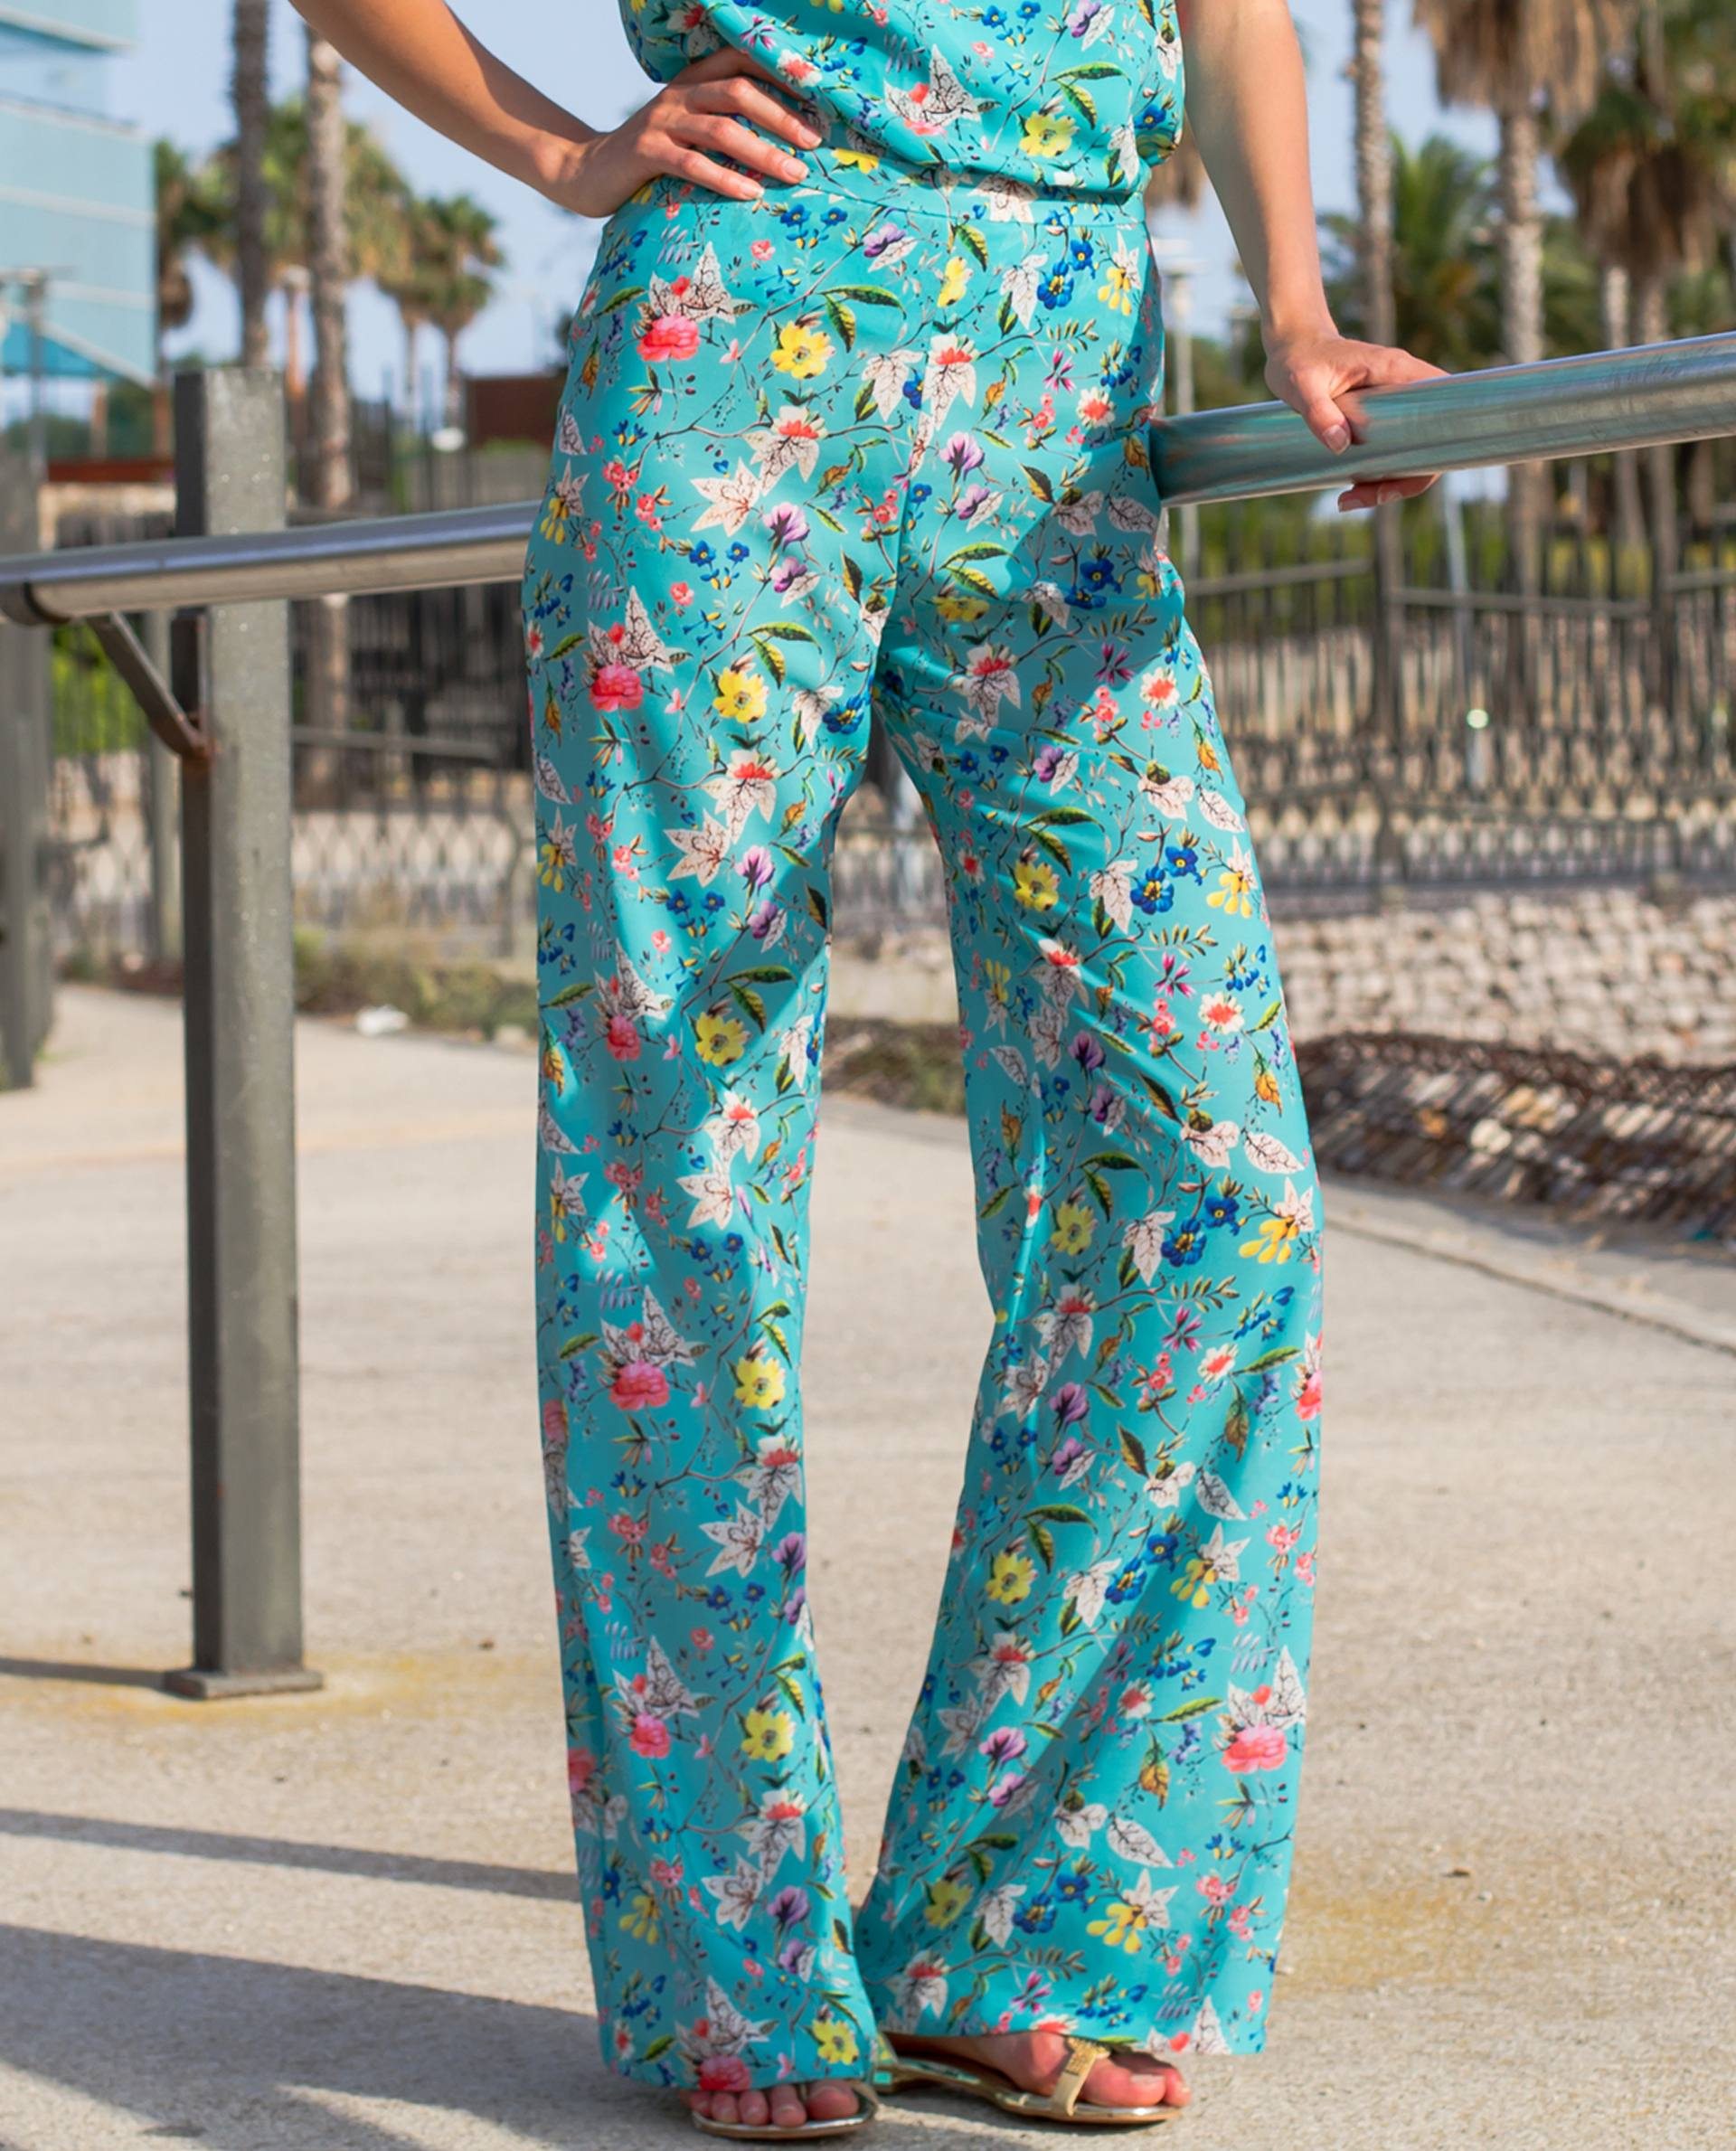 PRÊT À PORTER-SPRING/SUMMER 2018 - PANTALONES - Pantalón Rodas estampado azul